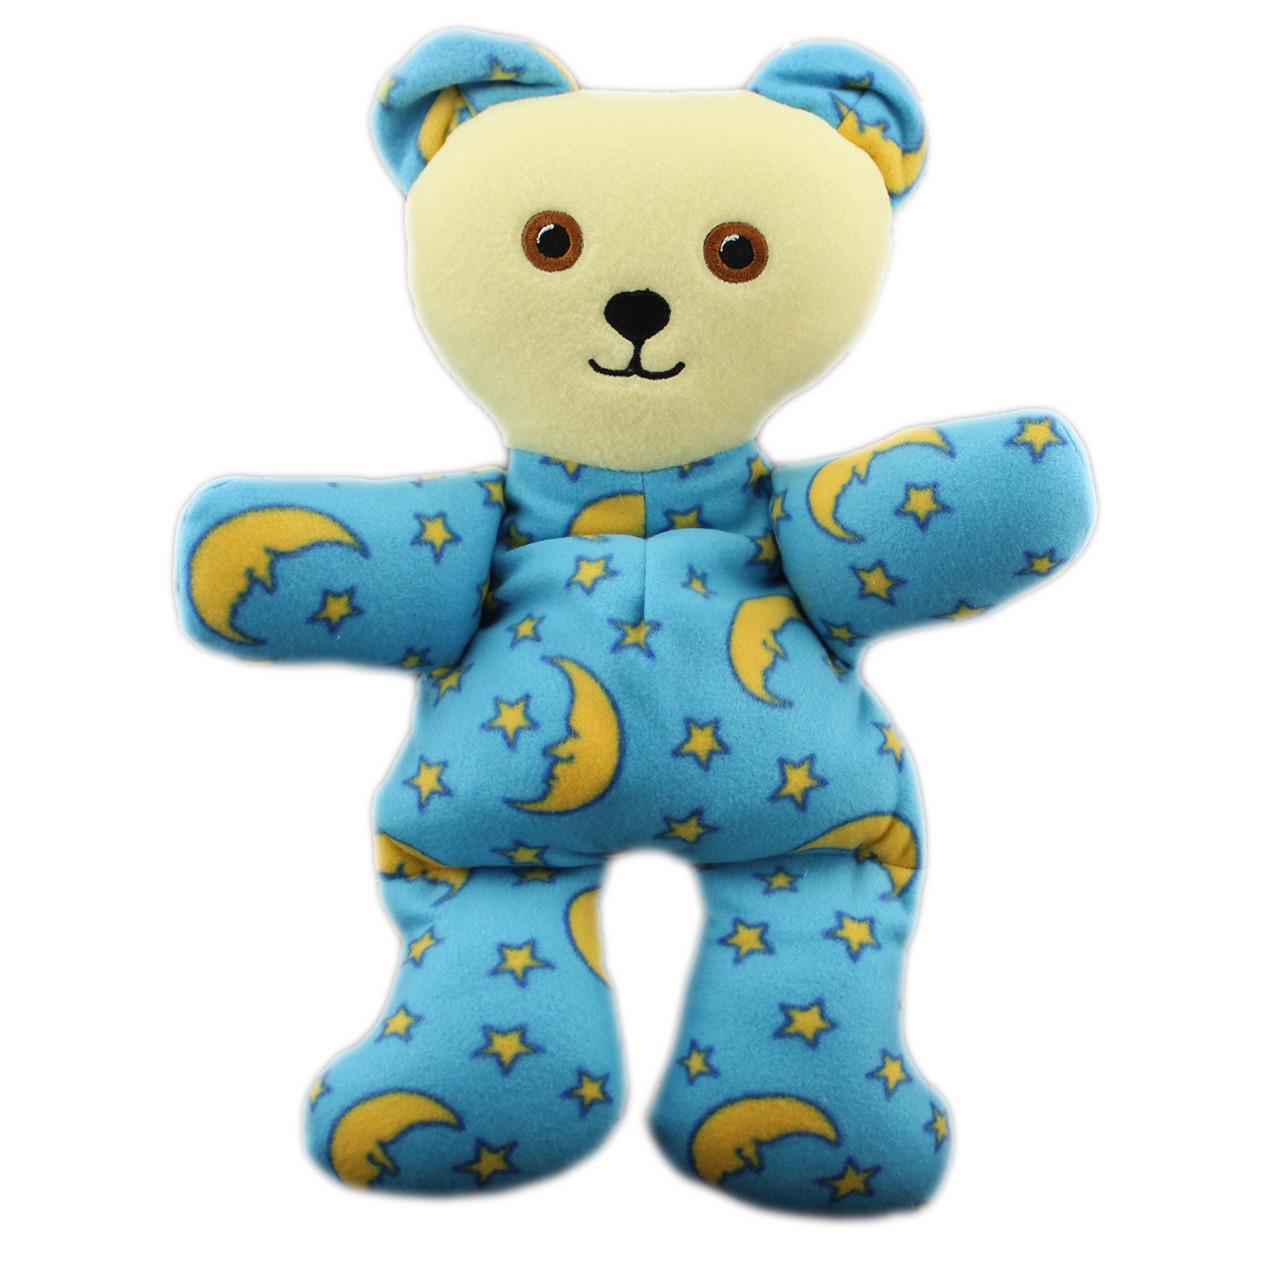 Heatable Celestial Thera Bear Weighted Stuffed Animal